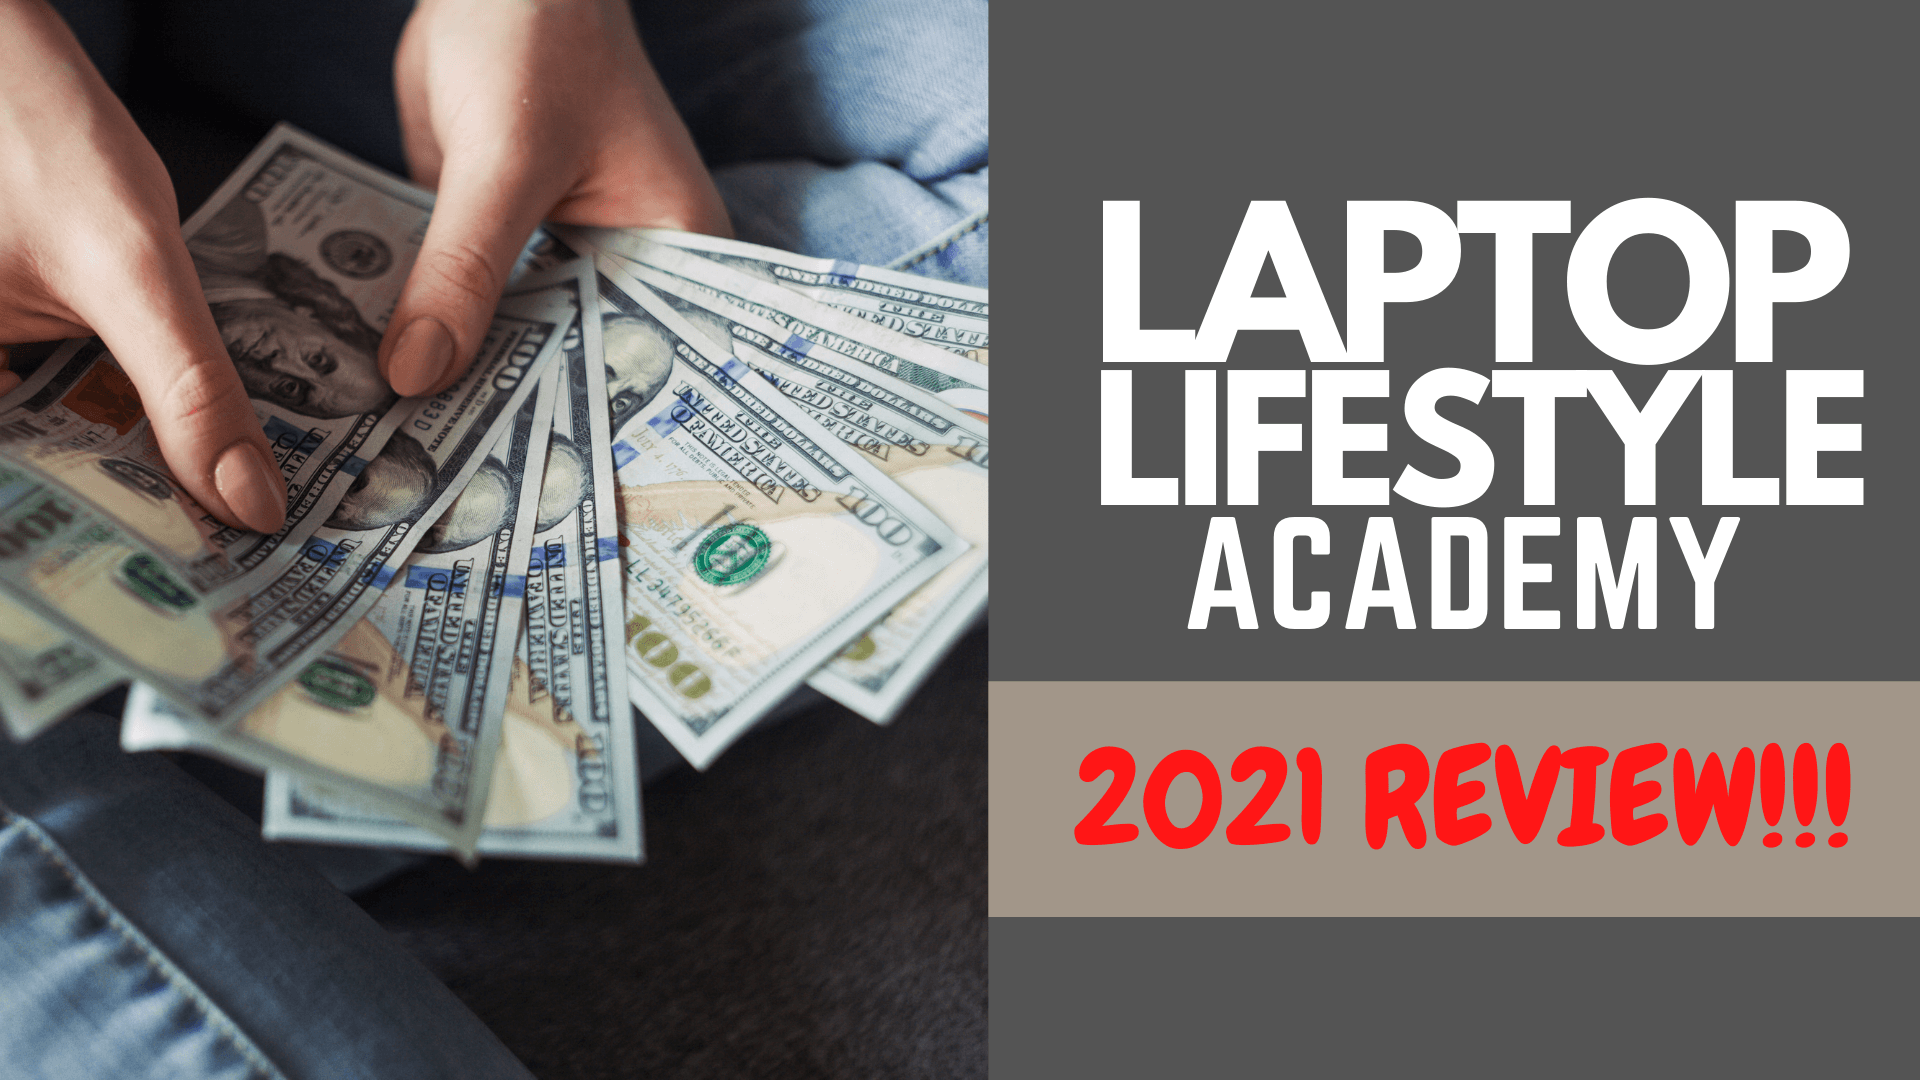 Laptop Lifestyle Academy Front Image